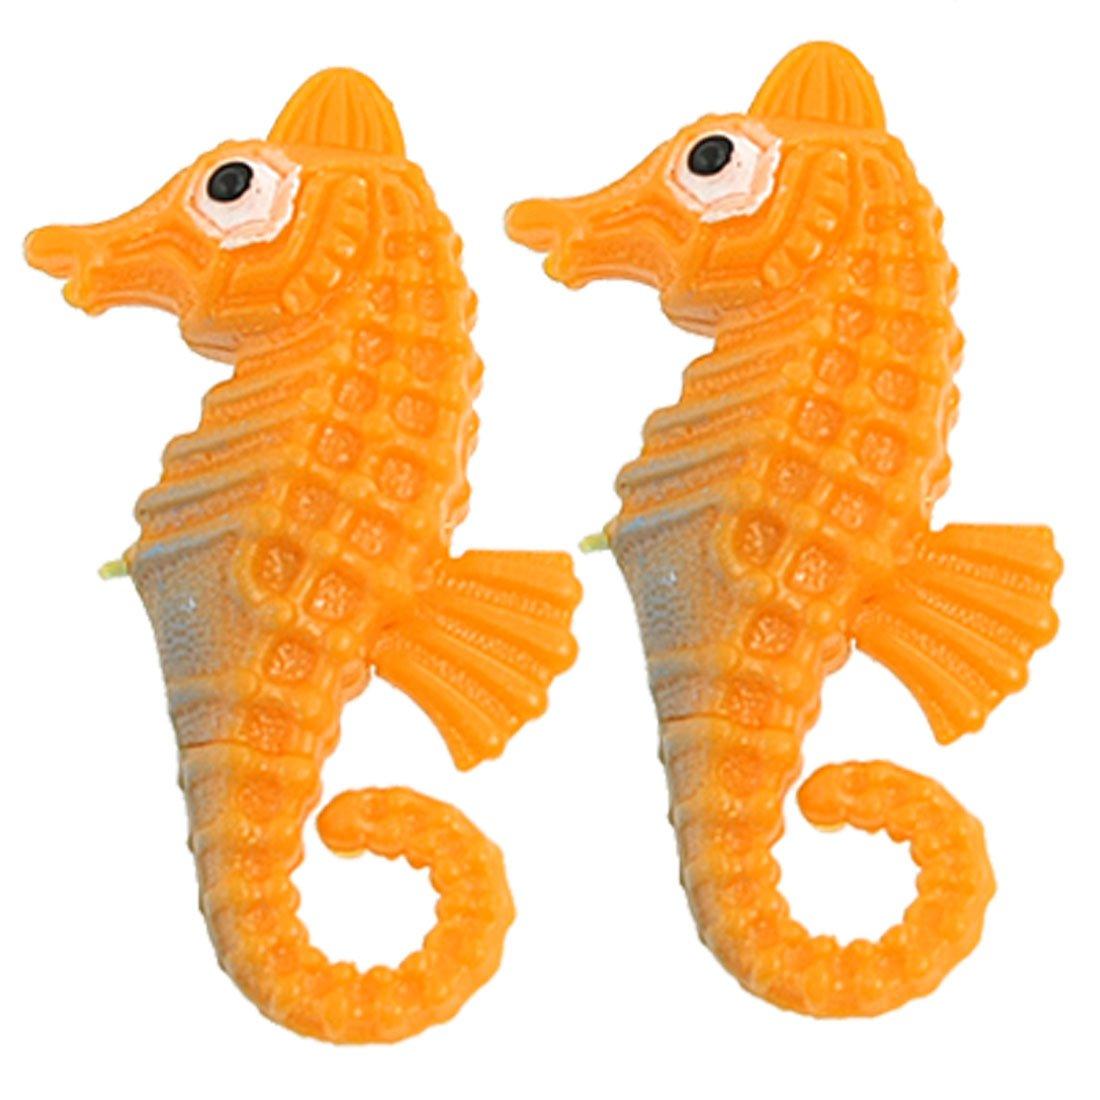 Jardin Jardin Jardin Emulational Nuoto 2-Piece Seahorse Ornamento per Acquario, Arancione 7af3aa